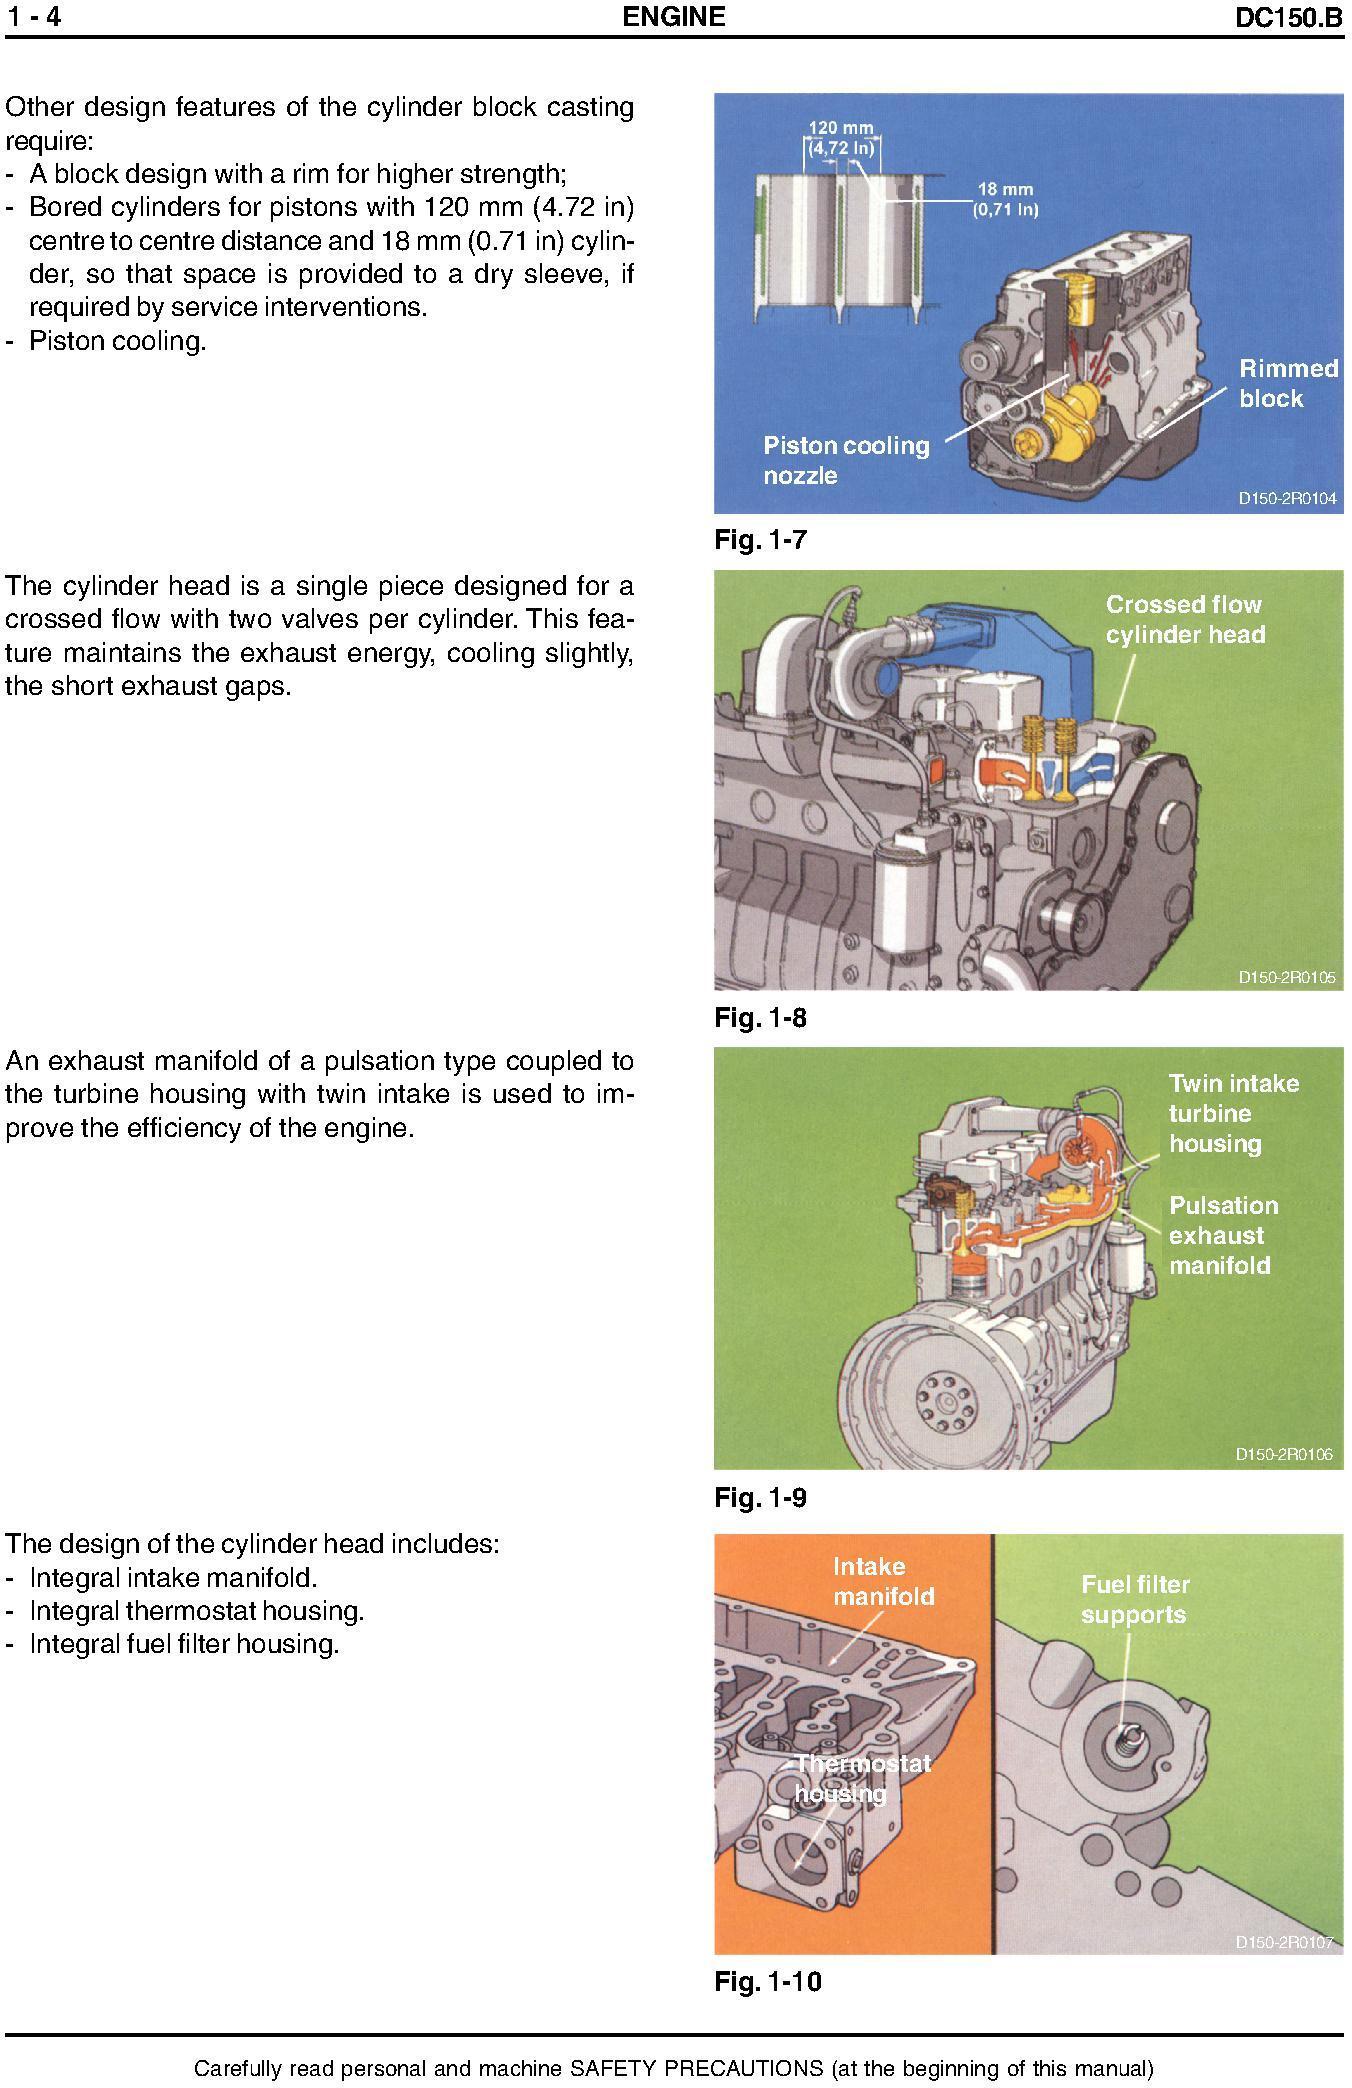 New Holland NH DC150.B Tier 2 Crawler Tractor Service Manual - 2